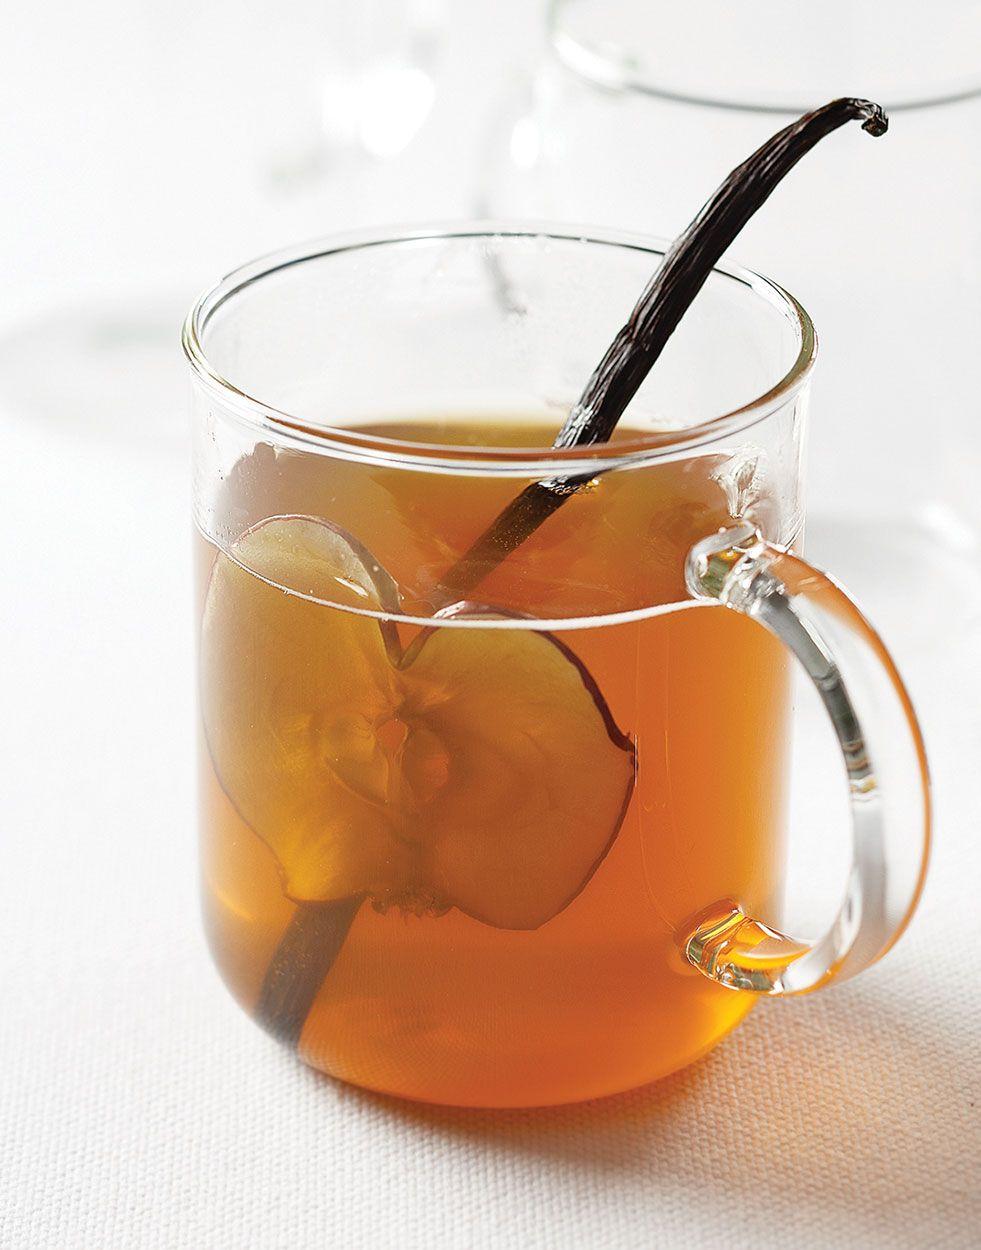 AppleHoney Toddies Recipe Apple cider, honey, Winter